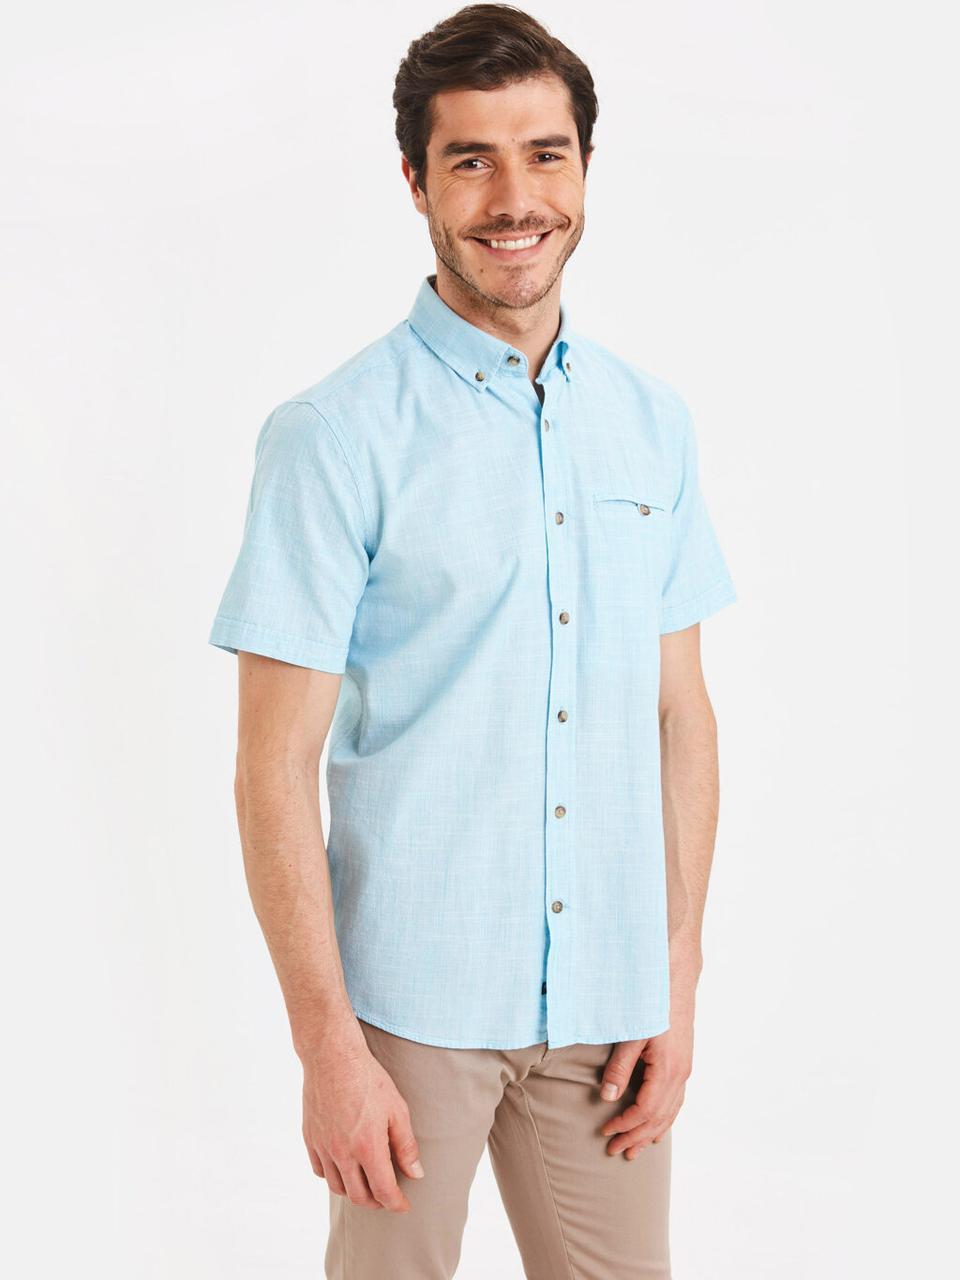 Голубая мужская рубашка LC Waikiki / ЛС Вайкики в мелкую белую клетку, с карманом на груди